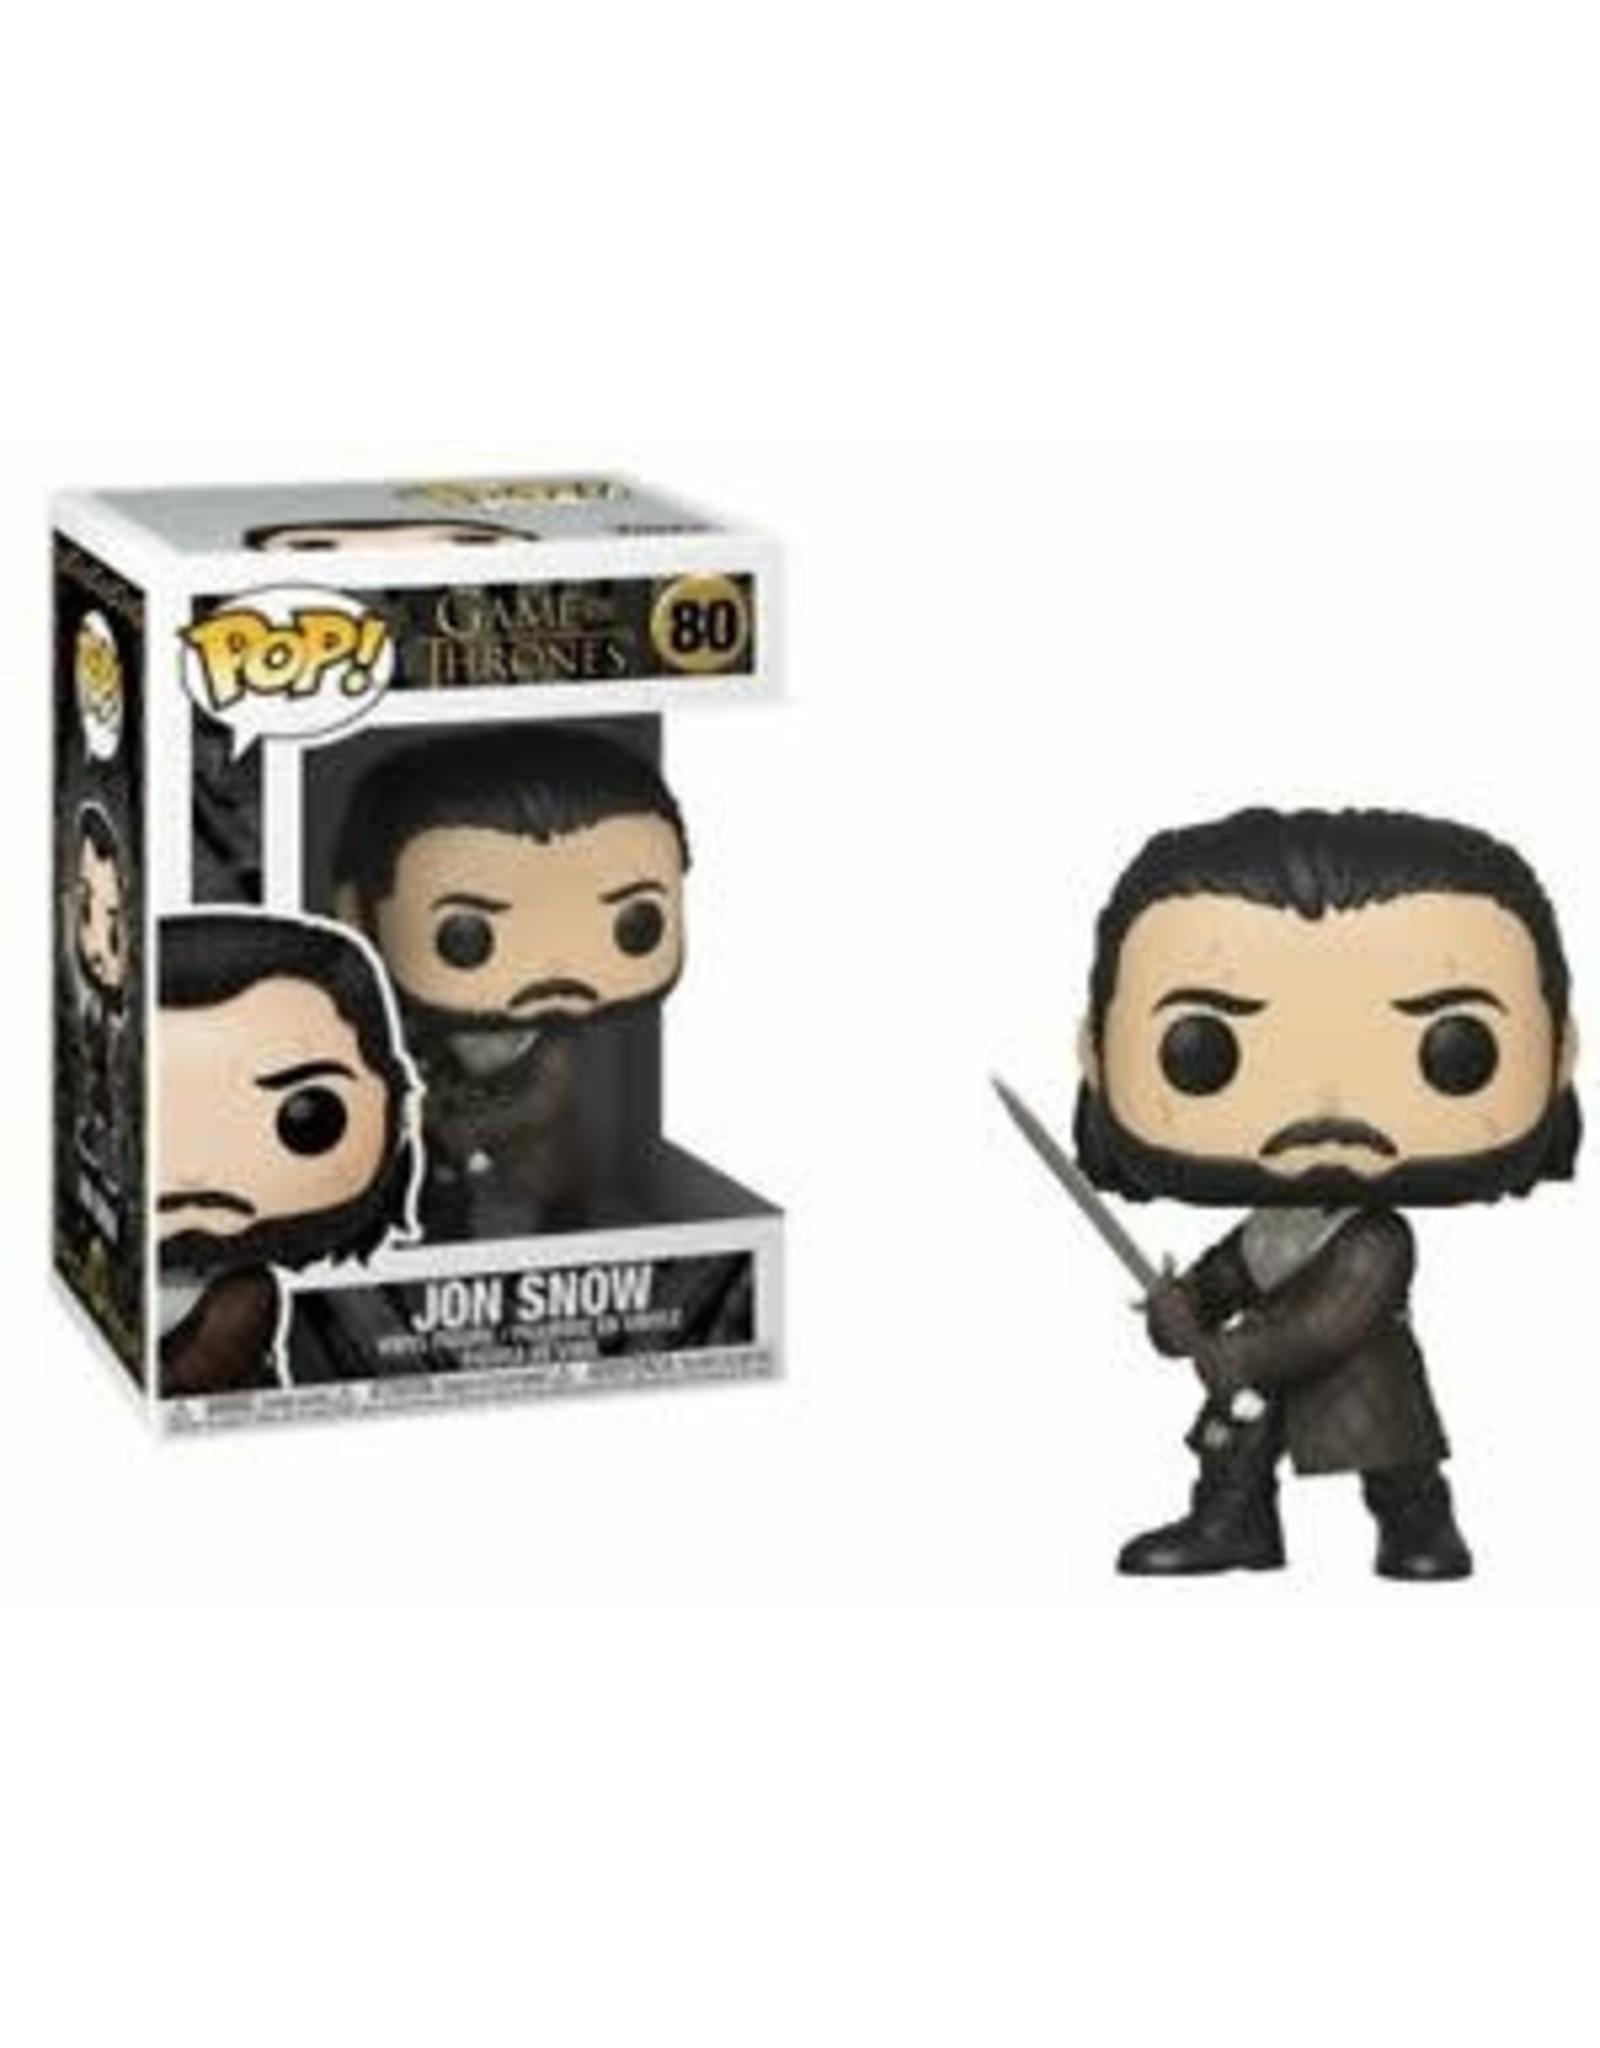 Game of Thrones POP! Television Vinyl Figure Jon Snow 9 cm